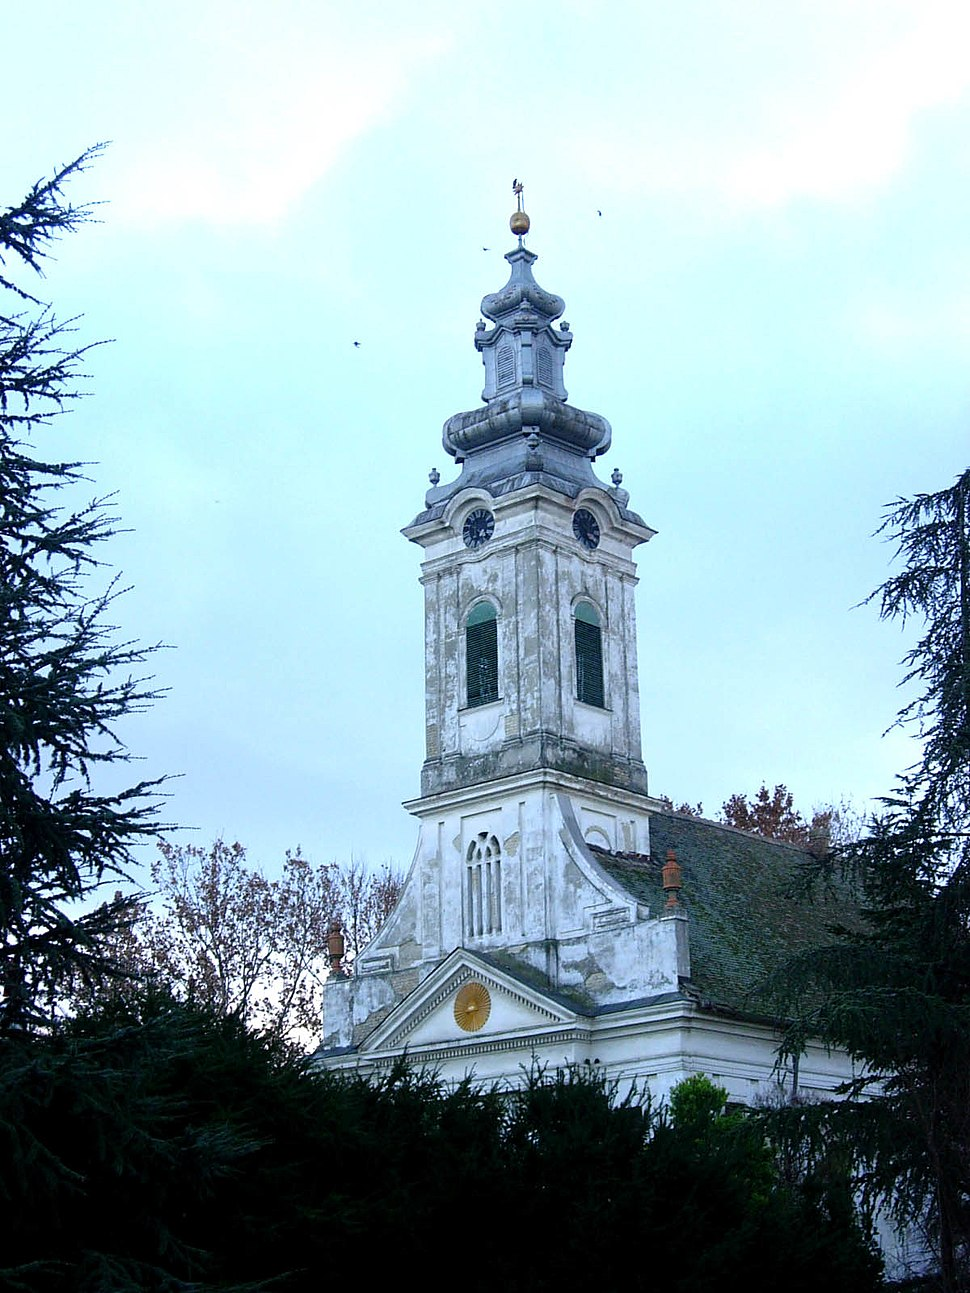 Vrbas, Calvinist church